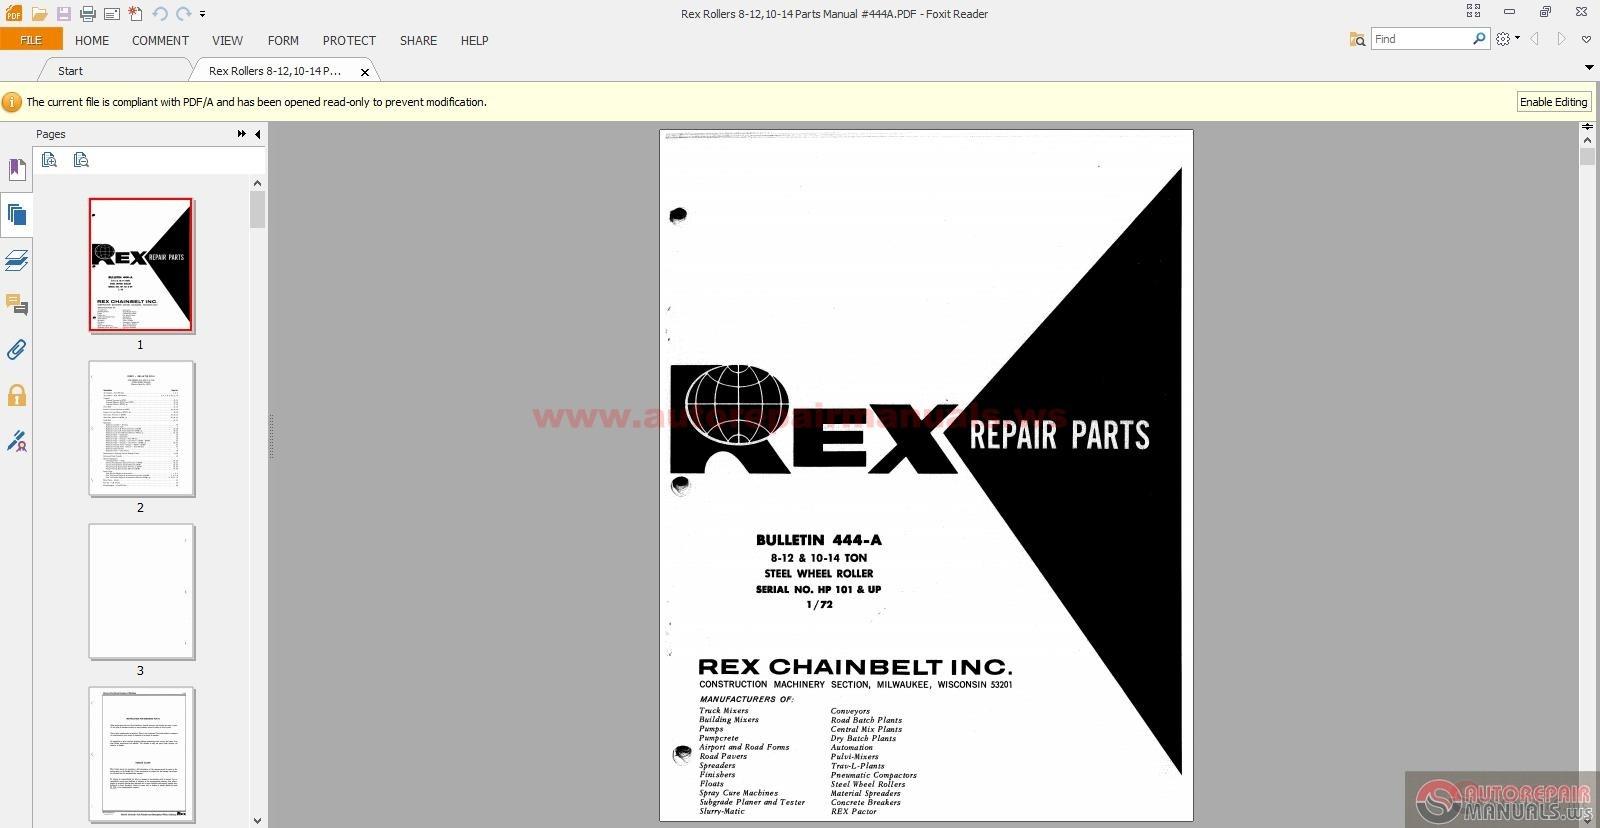 rex rollers 8 12 10 14 parts manual 444a auto repair manual forum heavy equipment forums. Black Bedroom Furniture Sets. Home Design Ideas